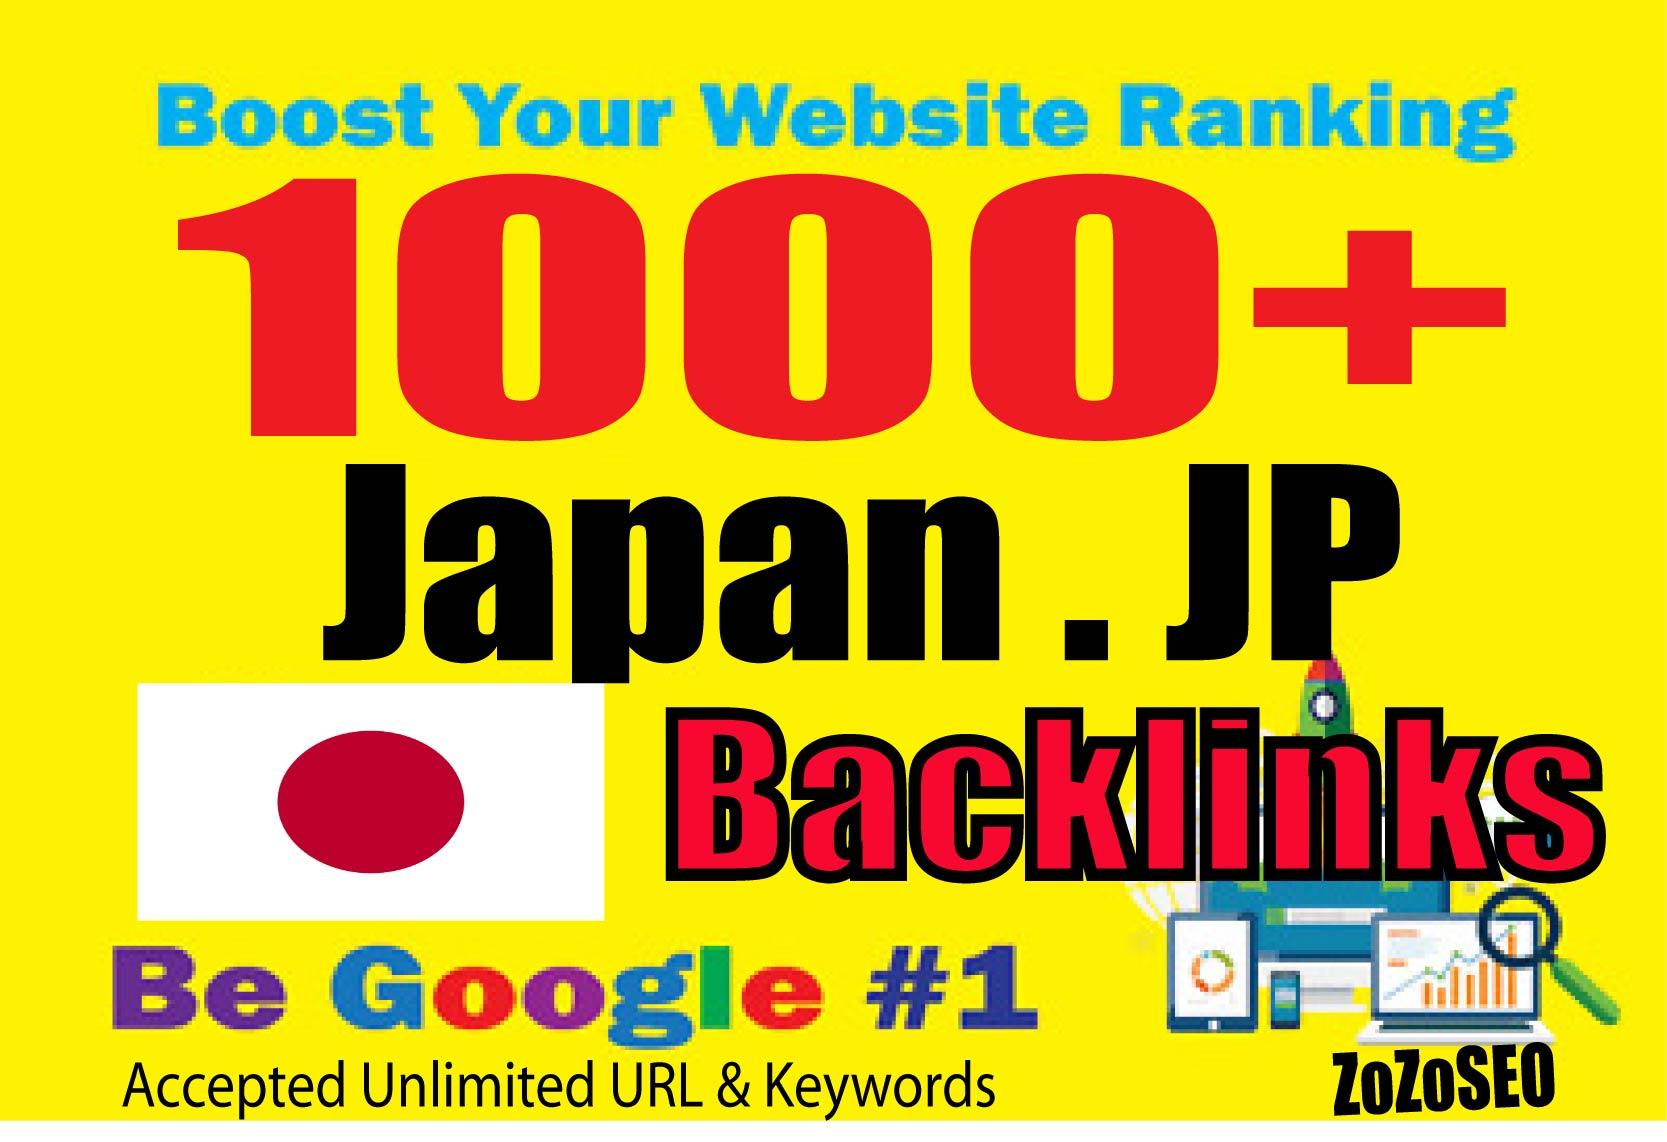 1000+ Japan. JP Backlinks From Local JP domains